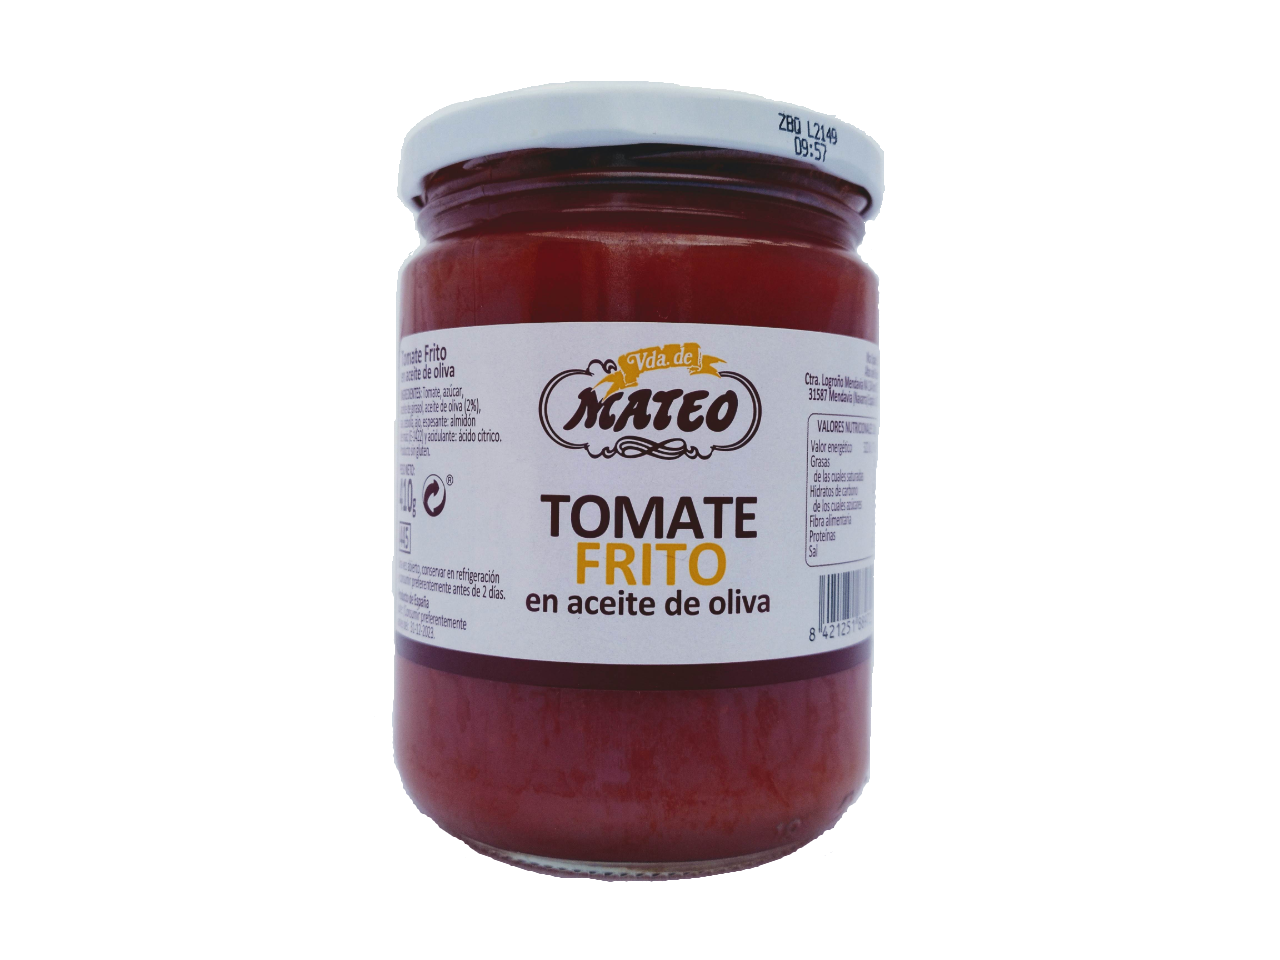 Tomate frito casero en aceite de oliva VDA DE MATEO tarro 410gr